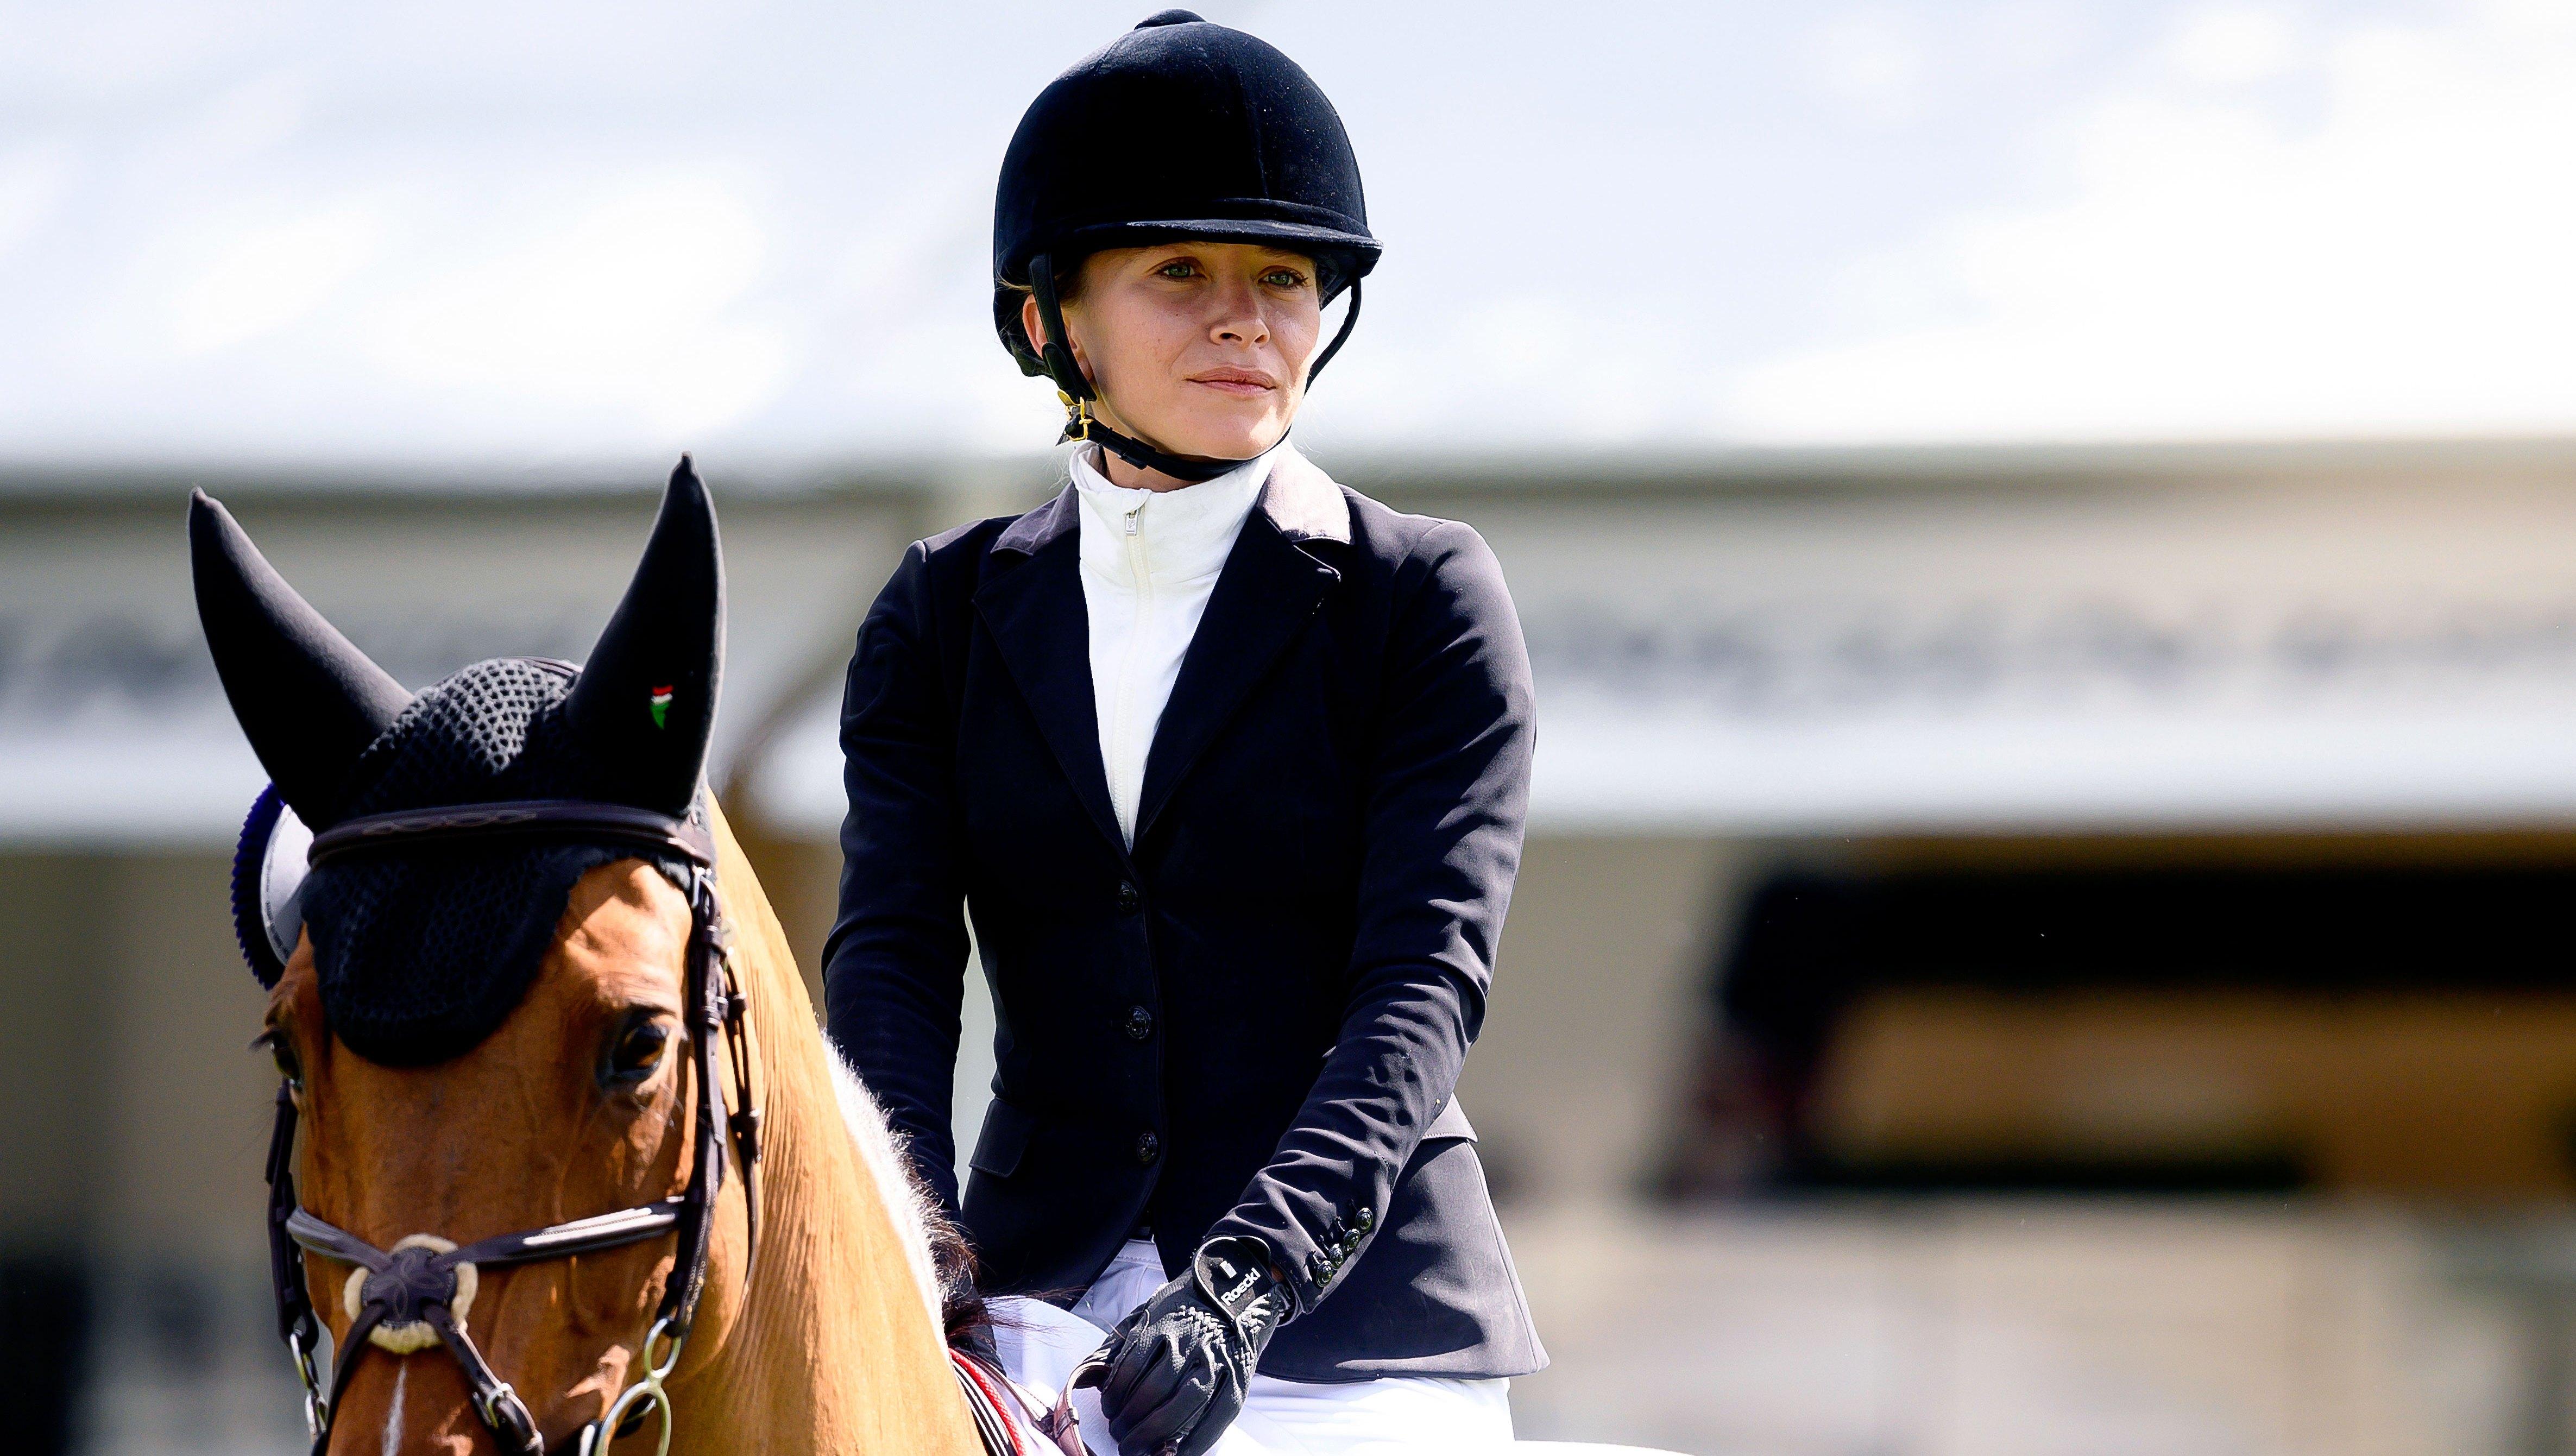 Mary-Kate Olsen Kisses Husband Olivier Sarkozy at Horseback Riding Event